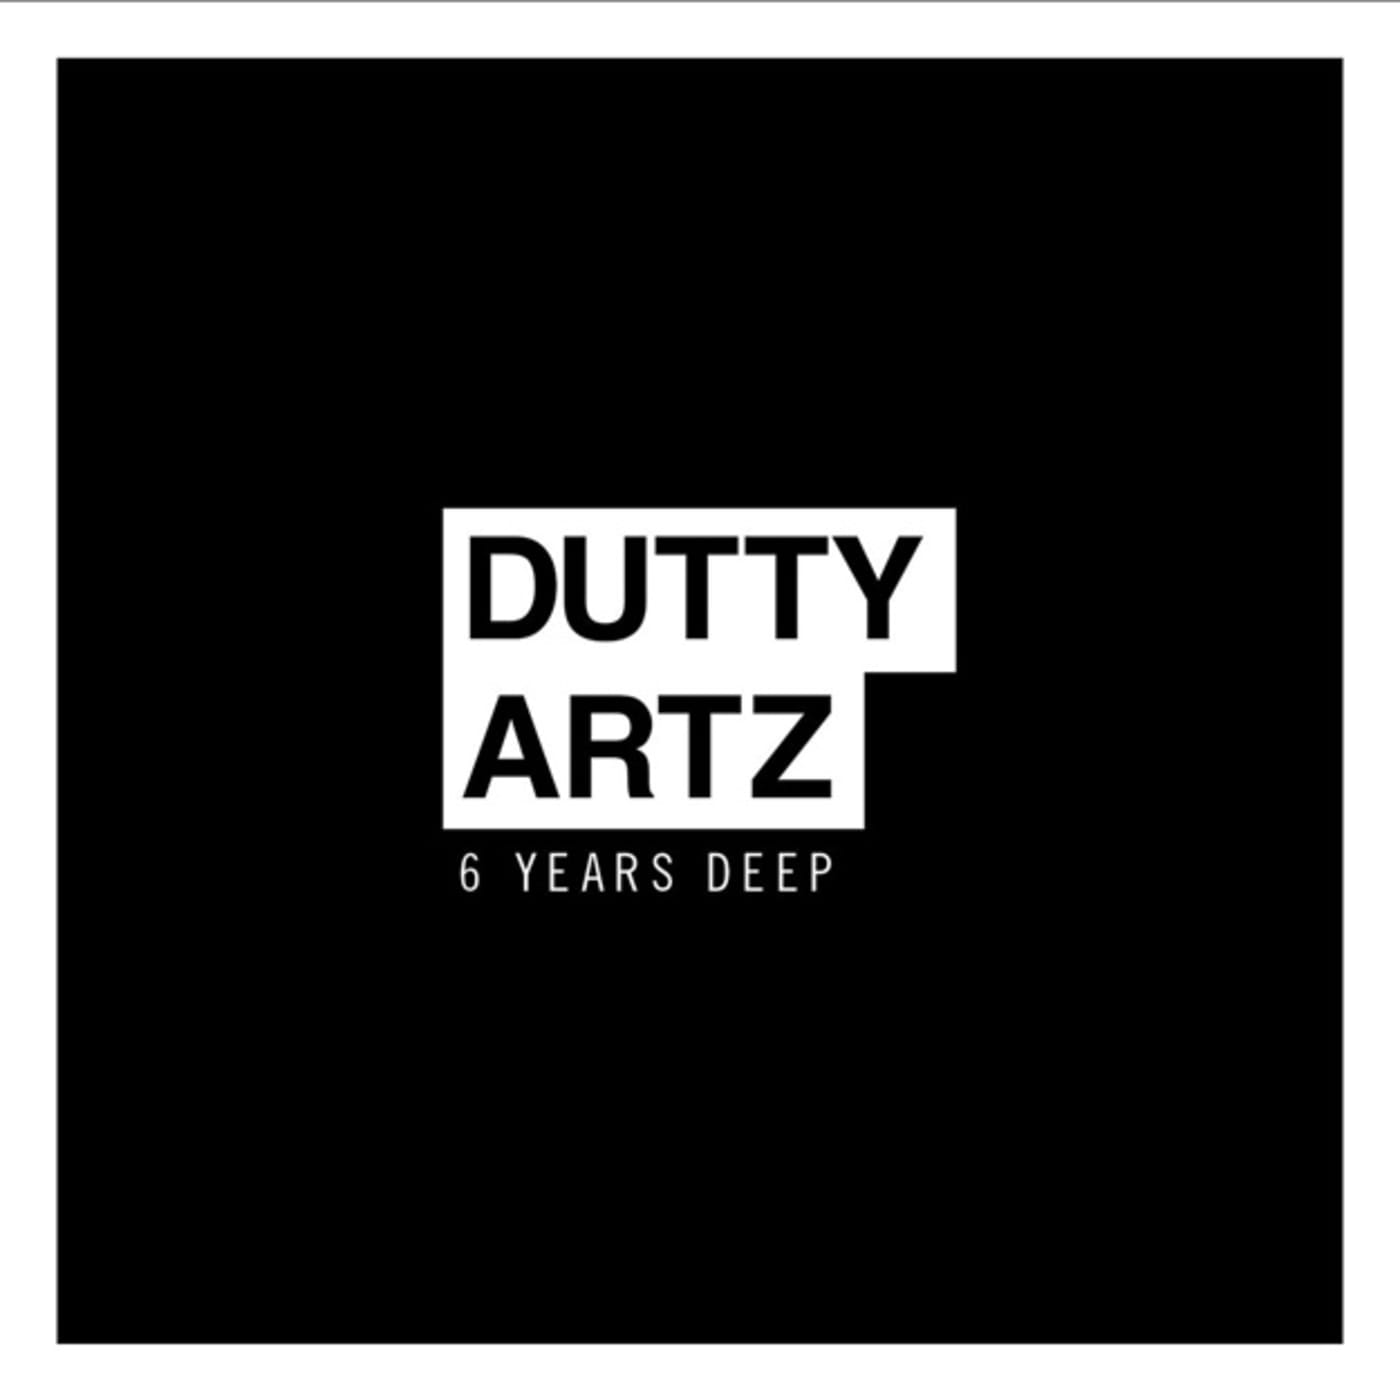 dutty artz 6 years deep